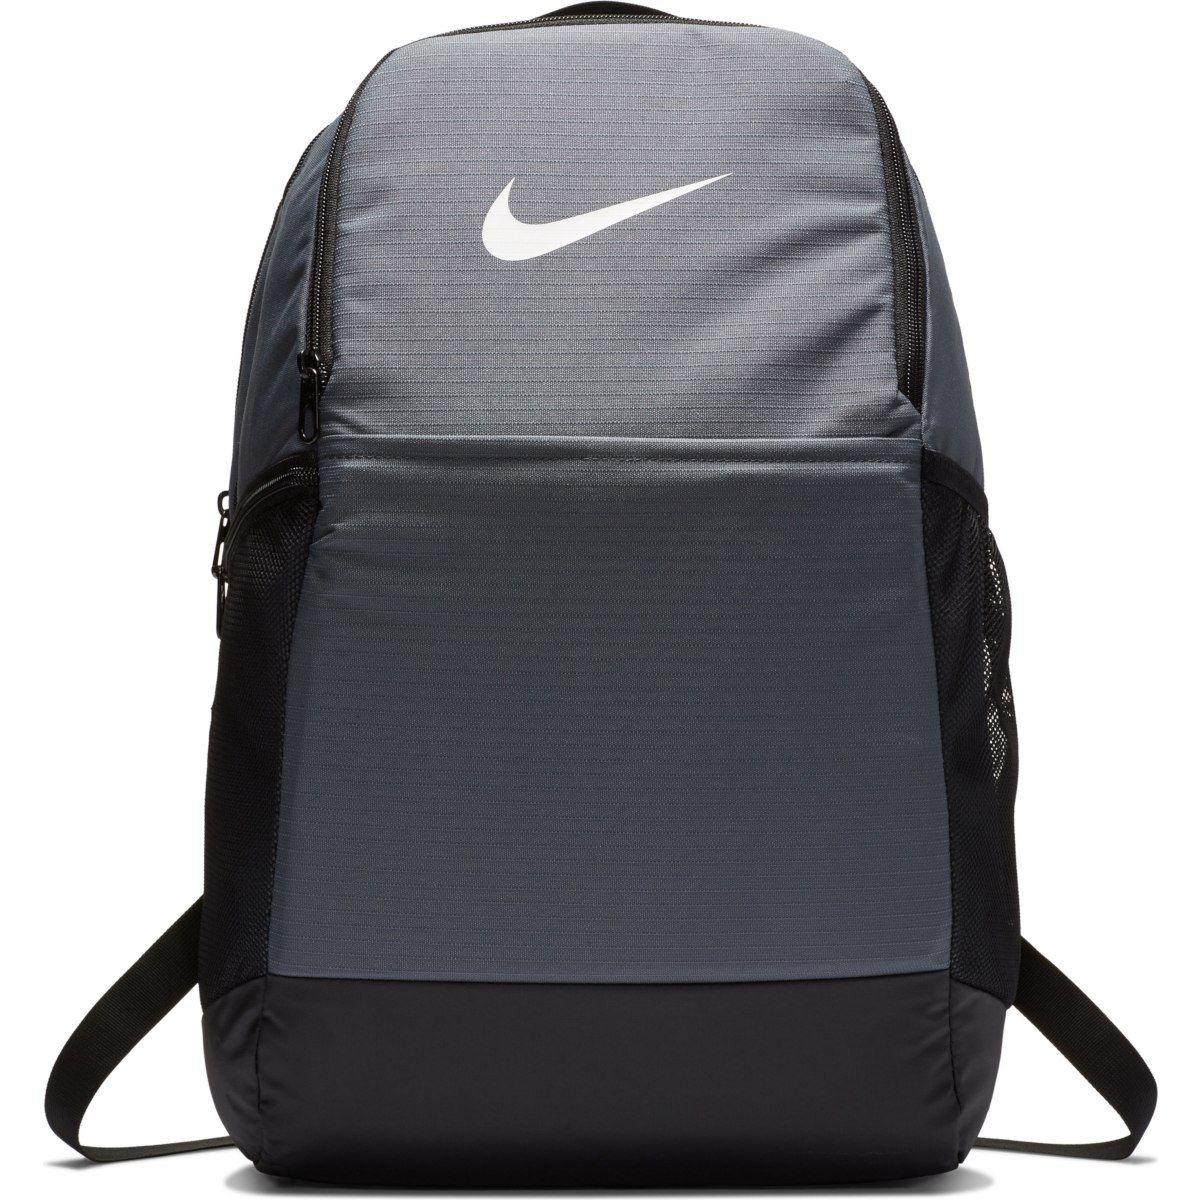 Mochila Nike Brasília 9.0 24 Litros - Cinza  - REAL ESPORTE